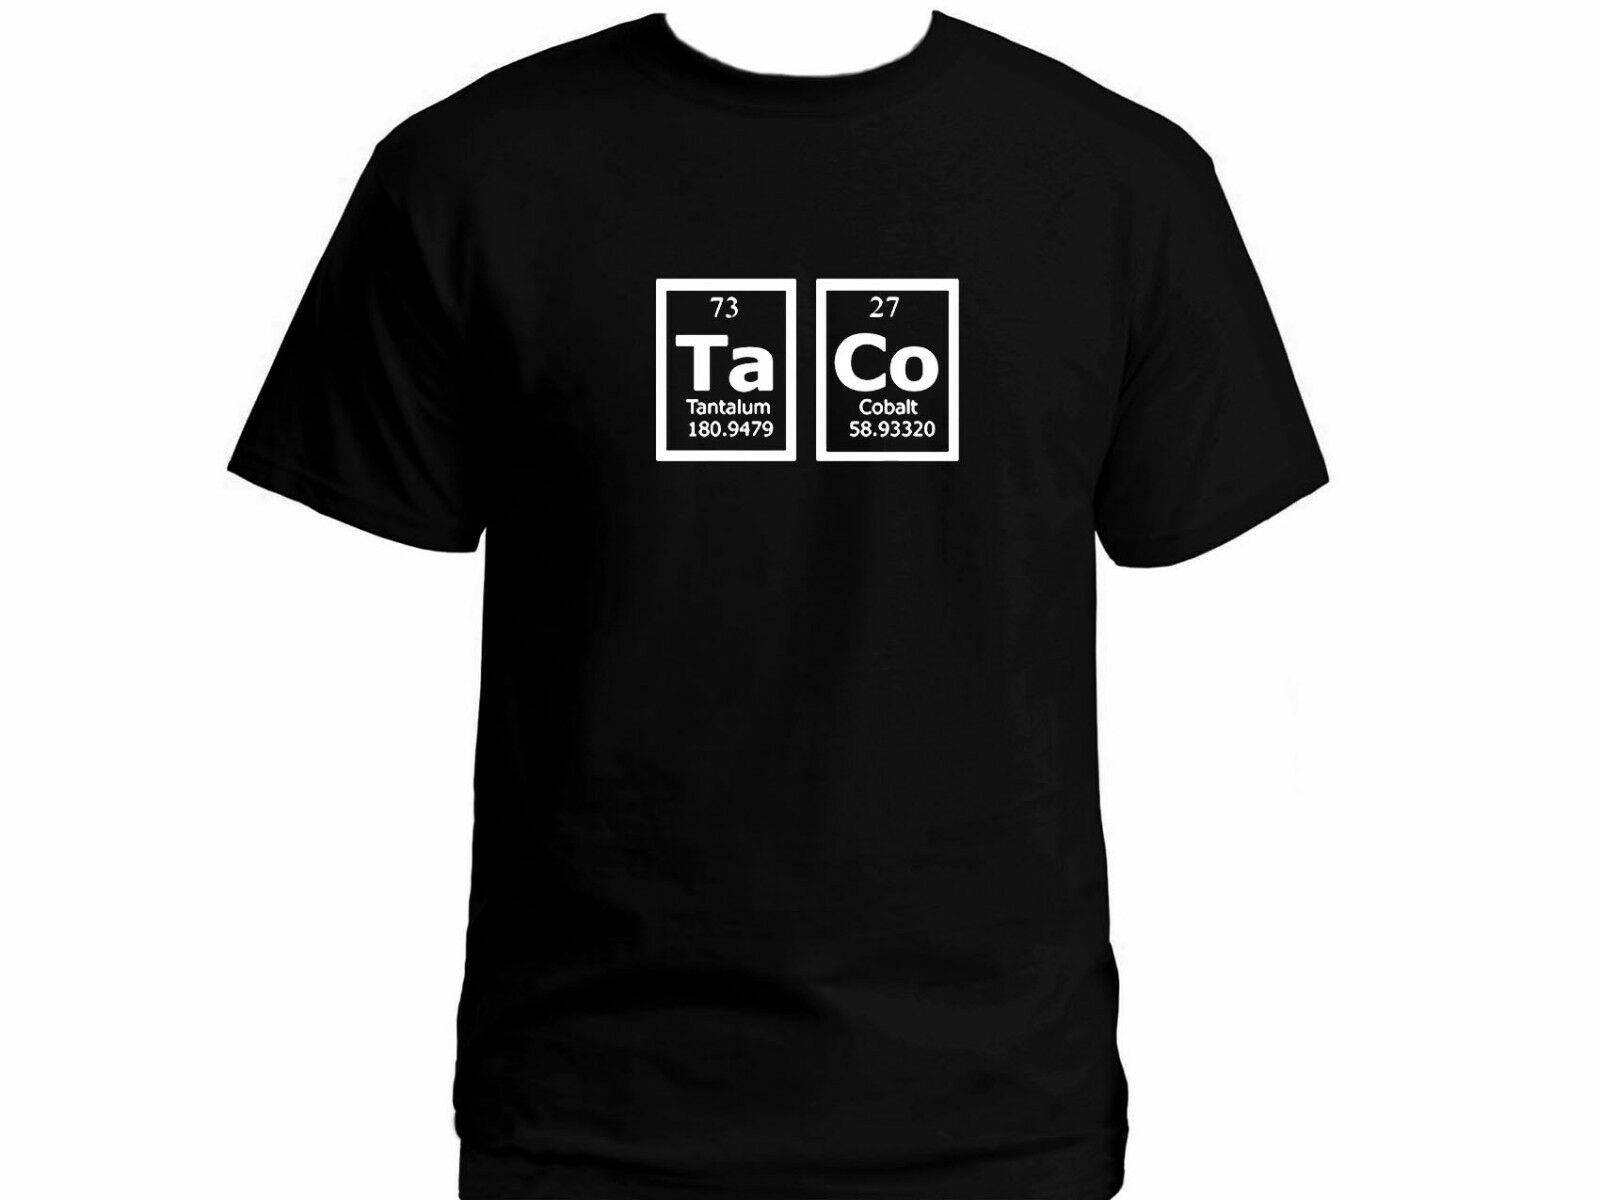 Taco Mendeleev Periodic Table Of Elements Geeks Gifts Black Tee